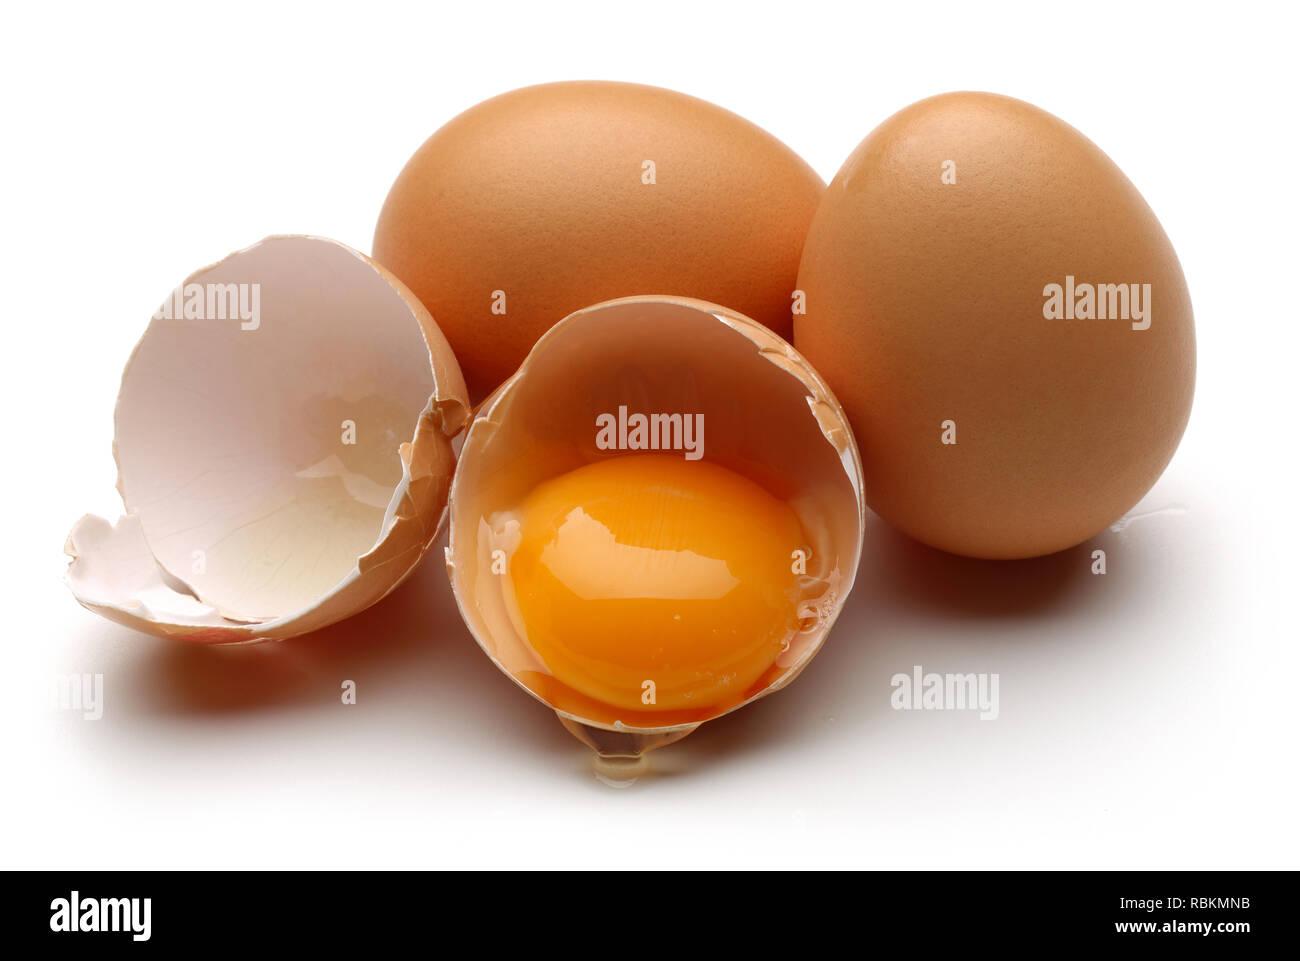 Broken Egg Isolated On White Background Stock Photo